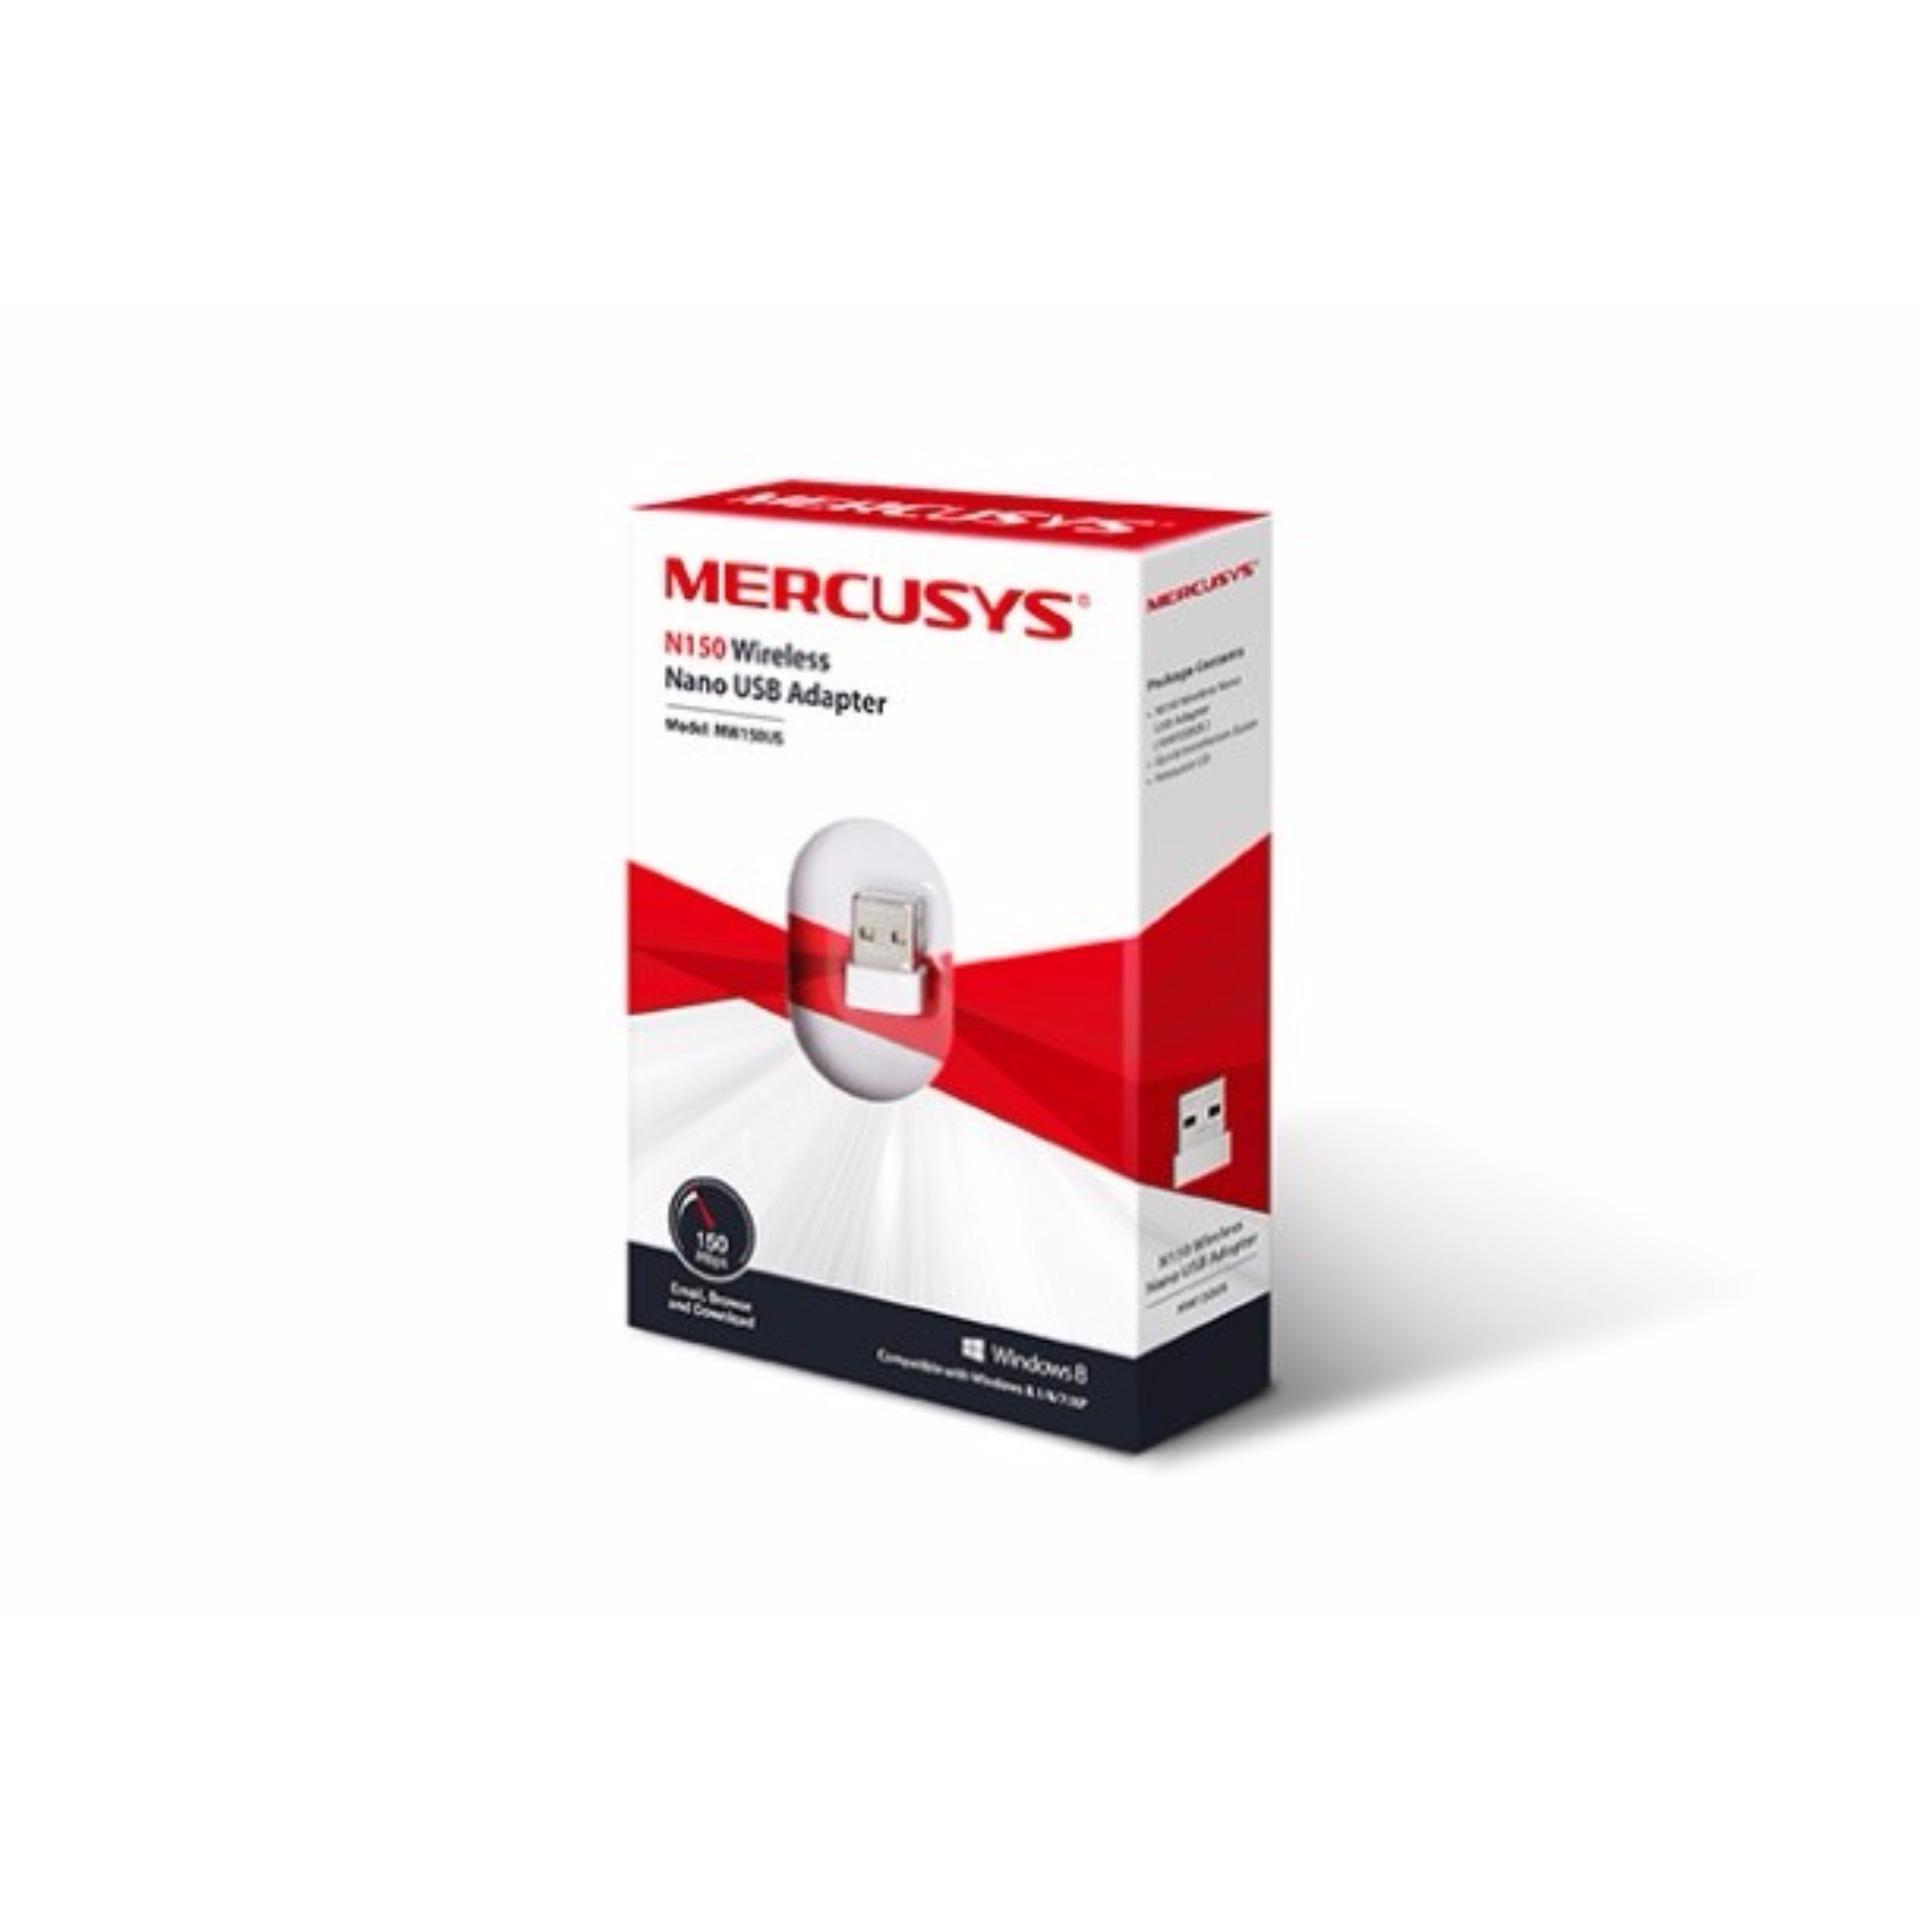 Thu sóng wifi Mercusys MW150US